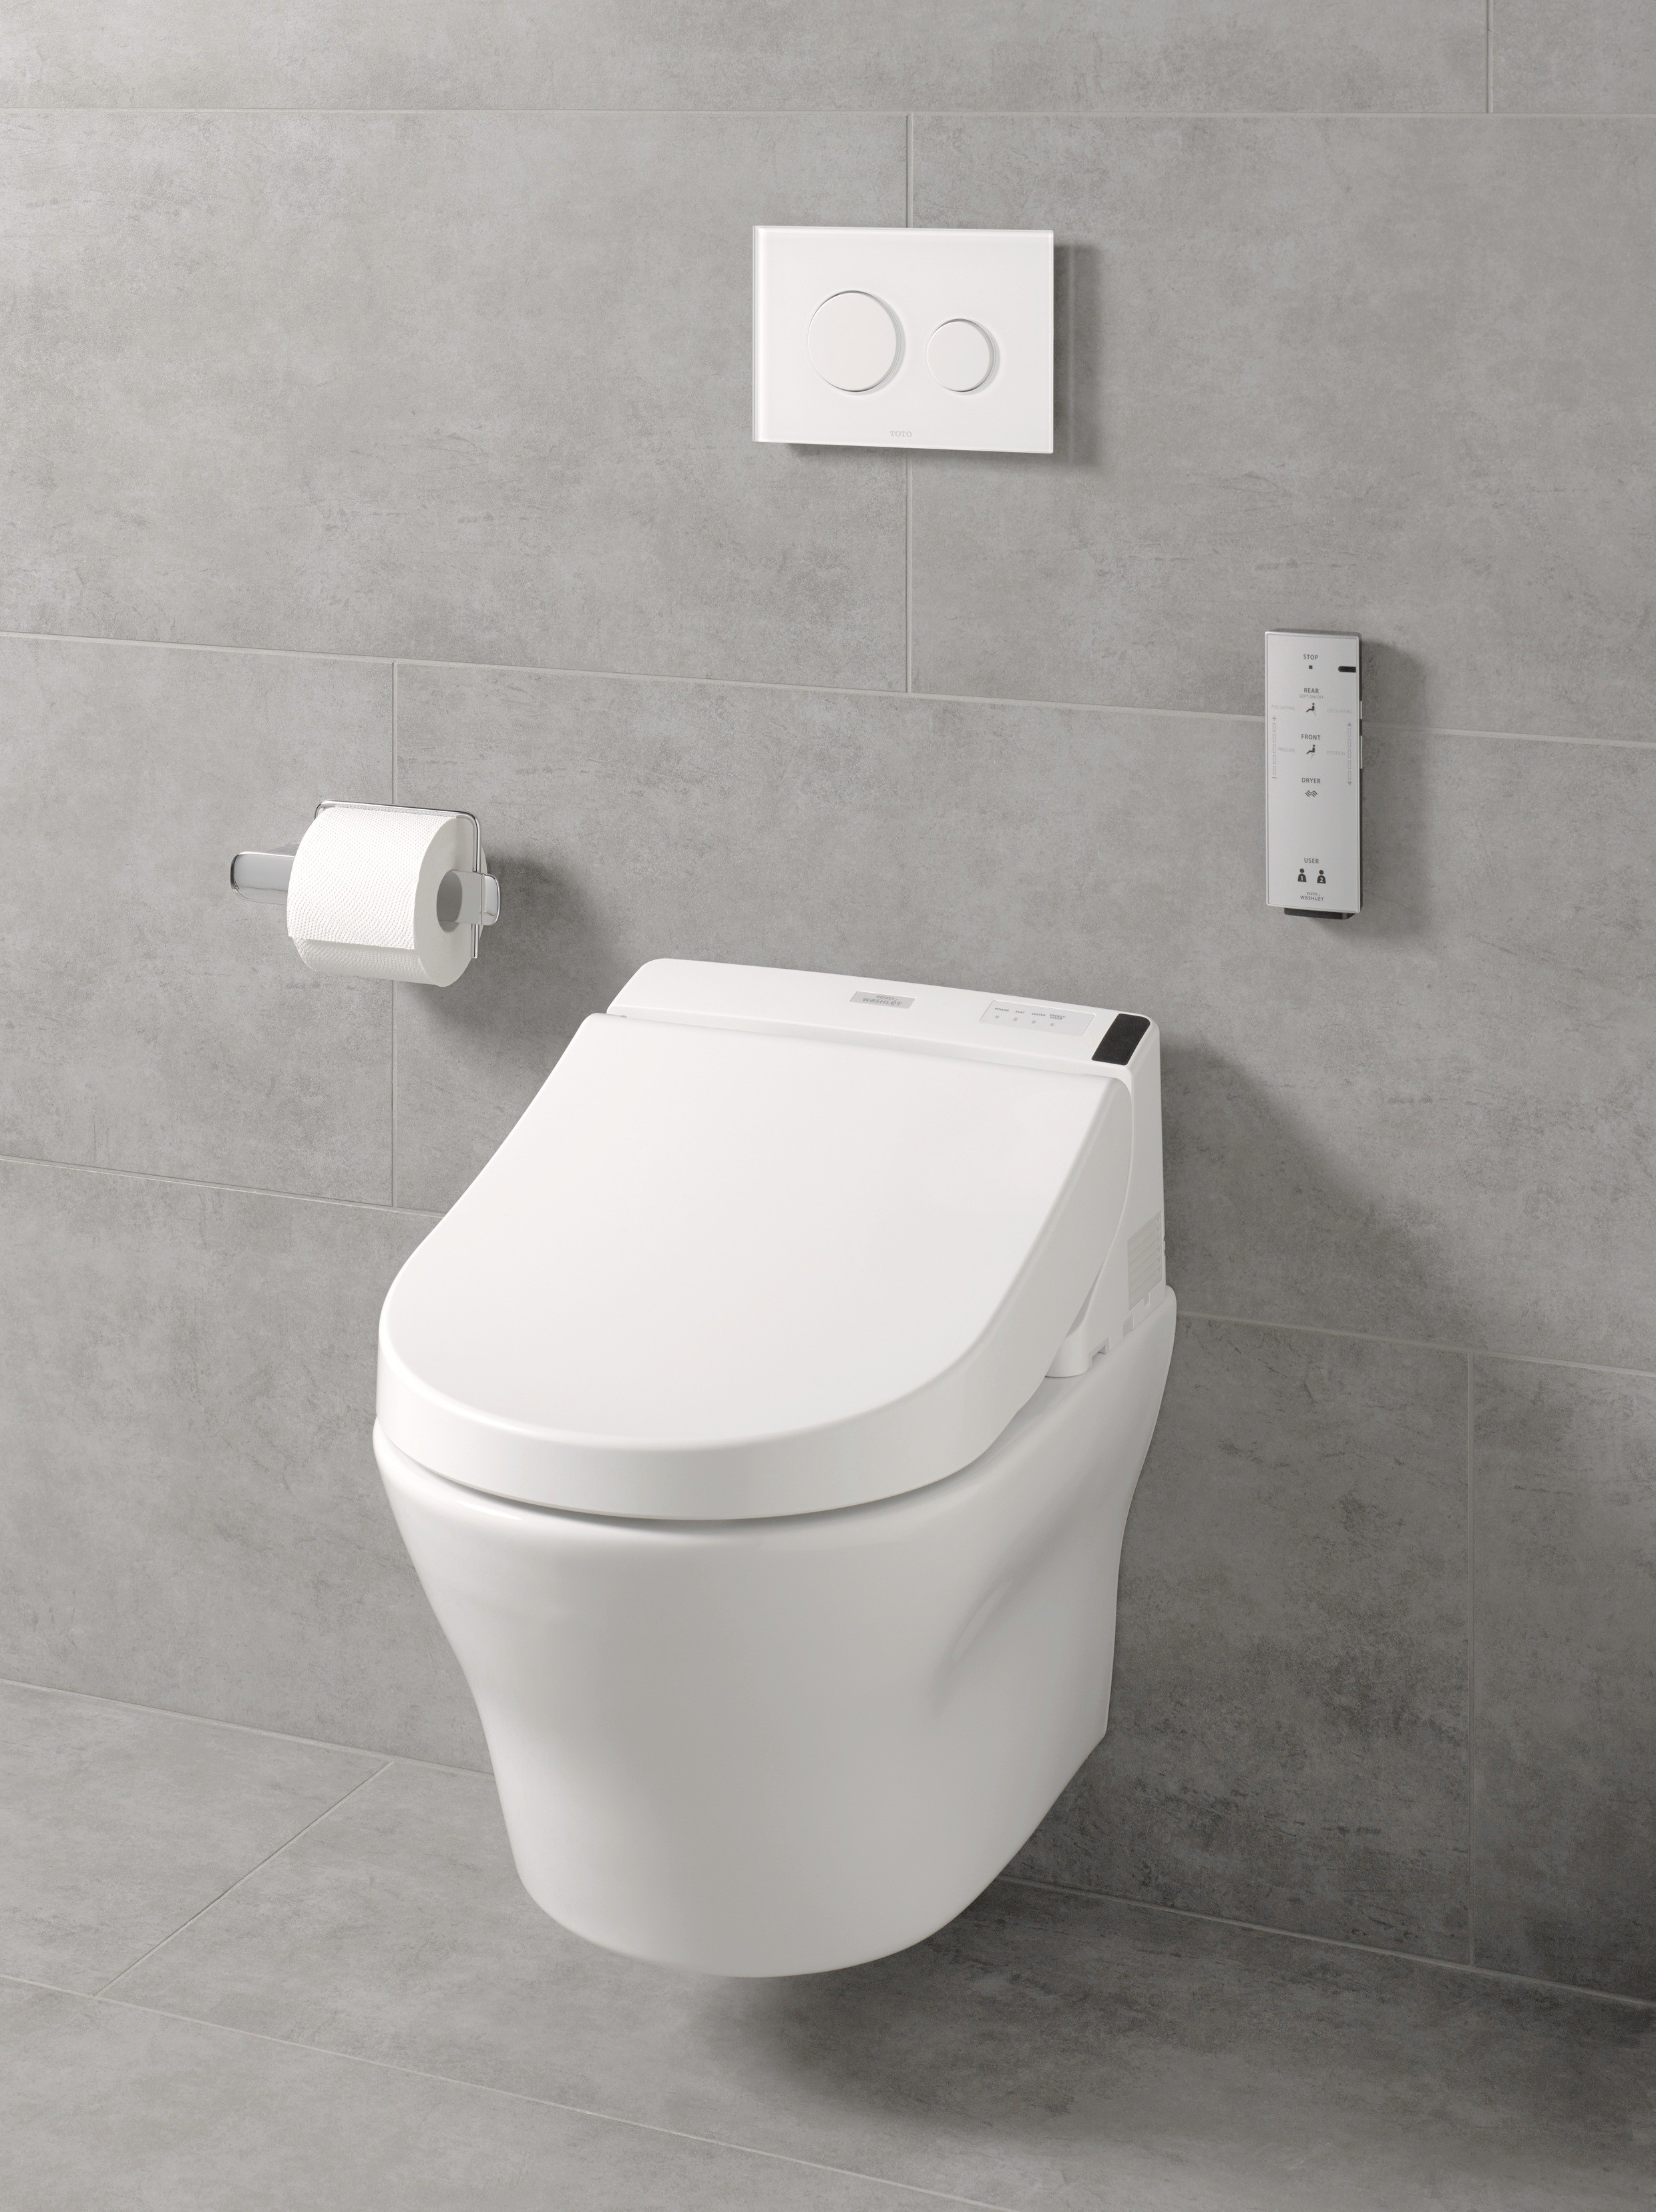 excellent toilette toto ideas bathtub for bathroom ideas. Black Bedroom Furniture Sets. Home Design Ideas